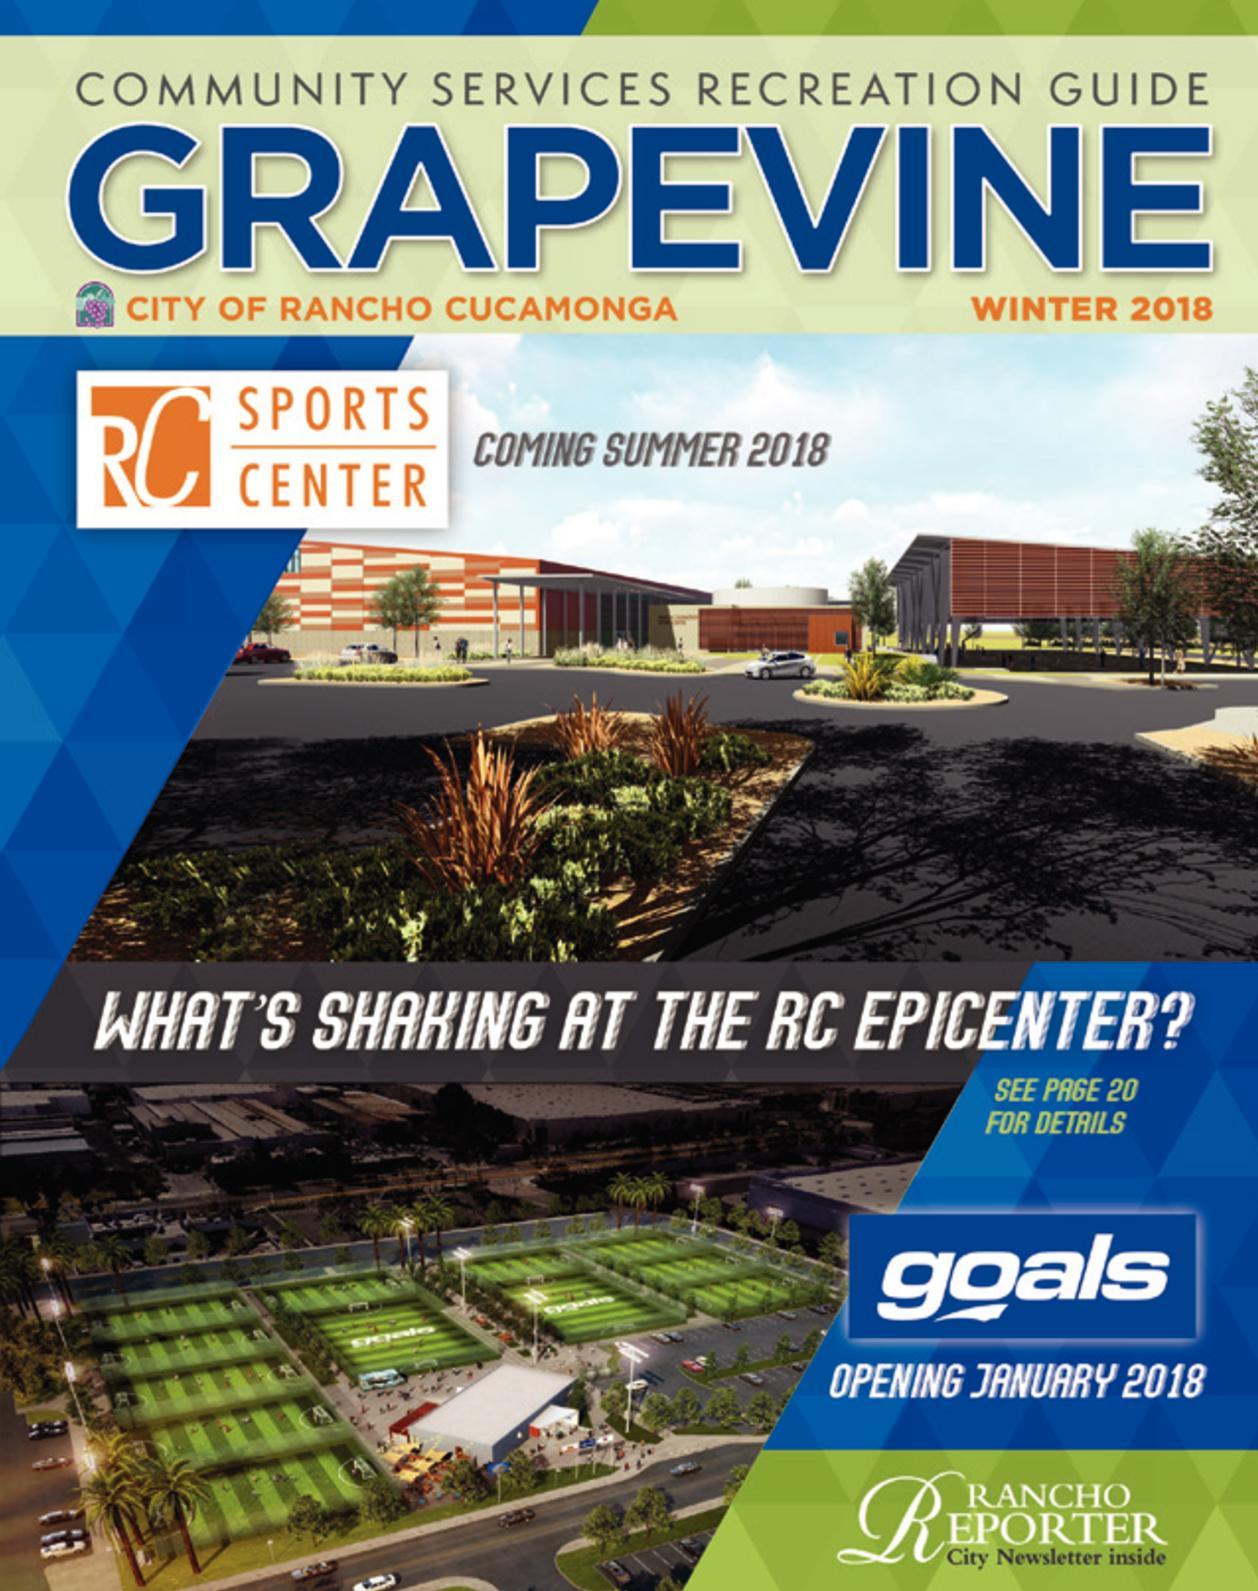 Calaméo - Winter 2018 Grapevine